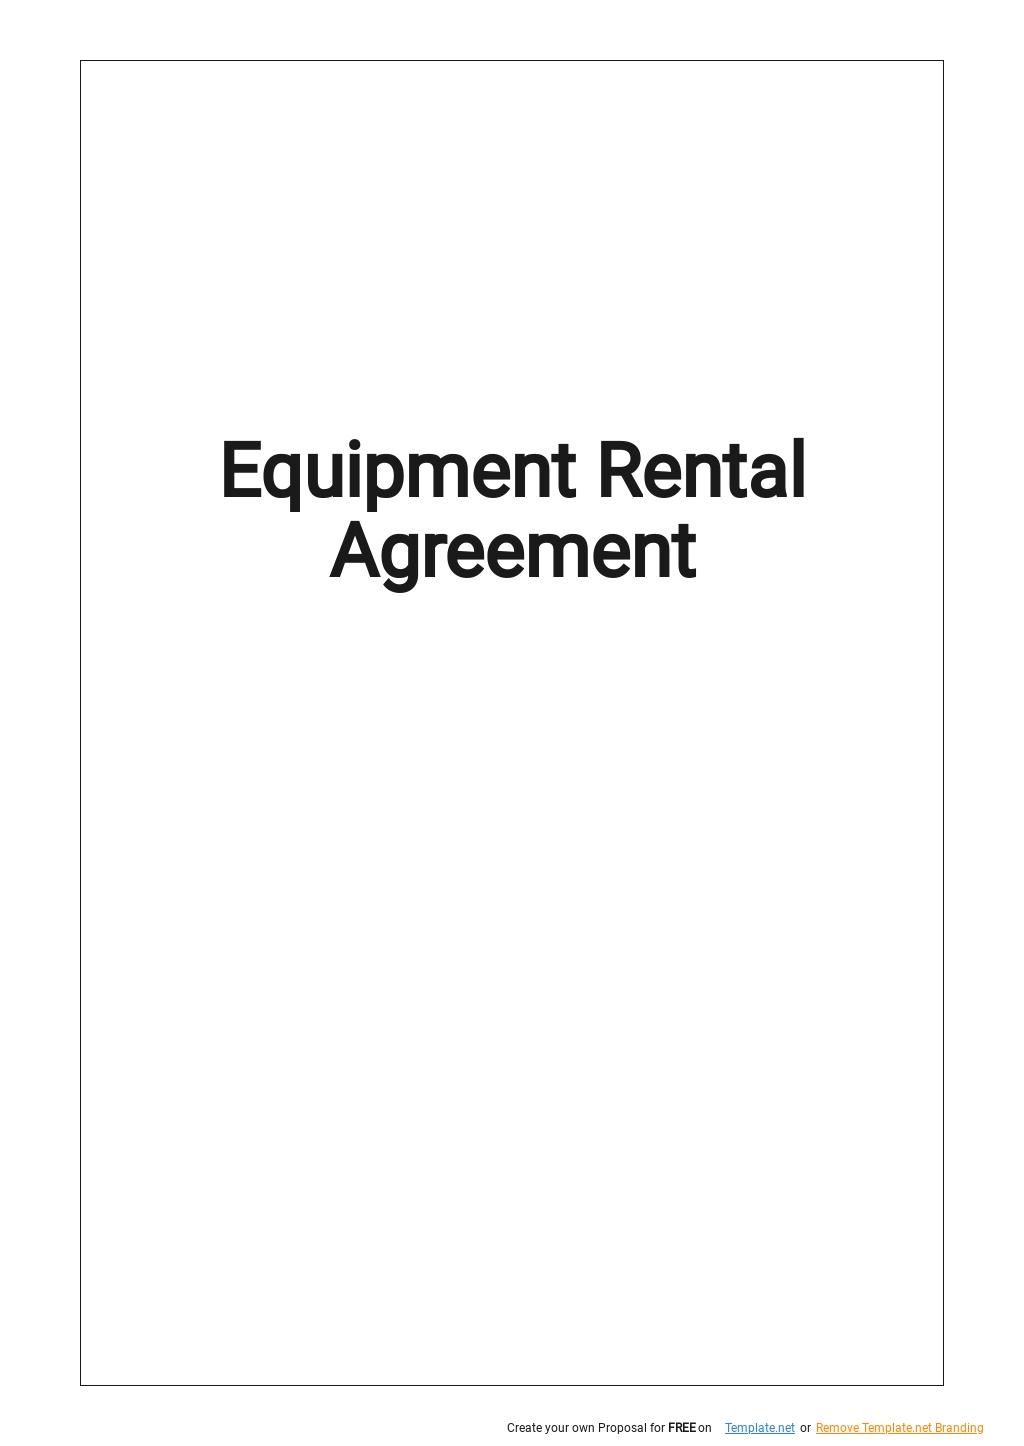 Simple Equipment Rental Agreement Template .jpe